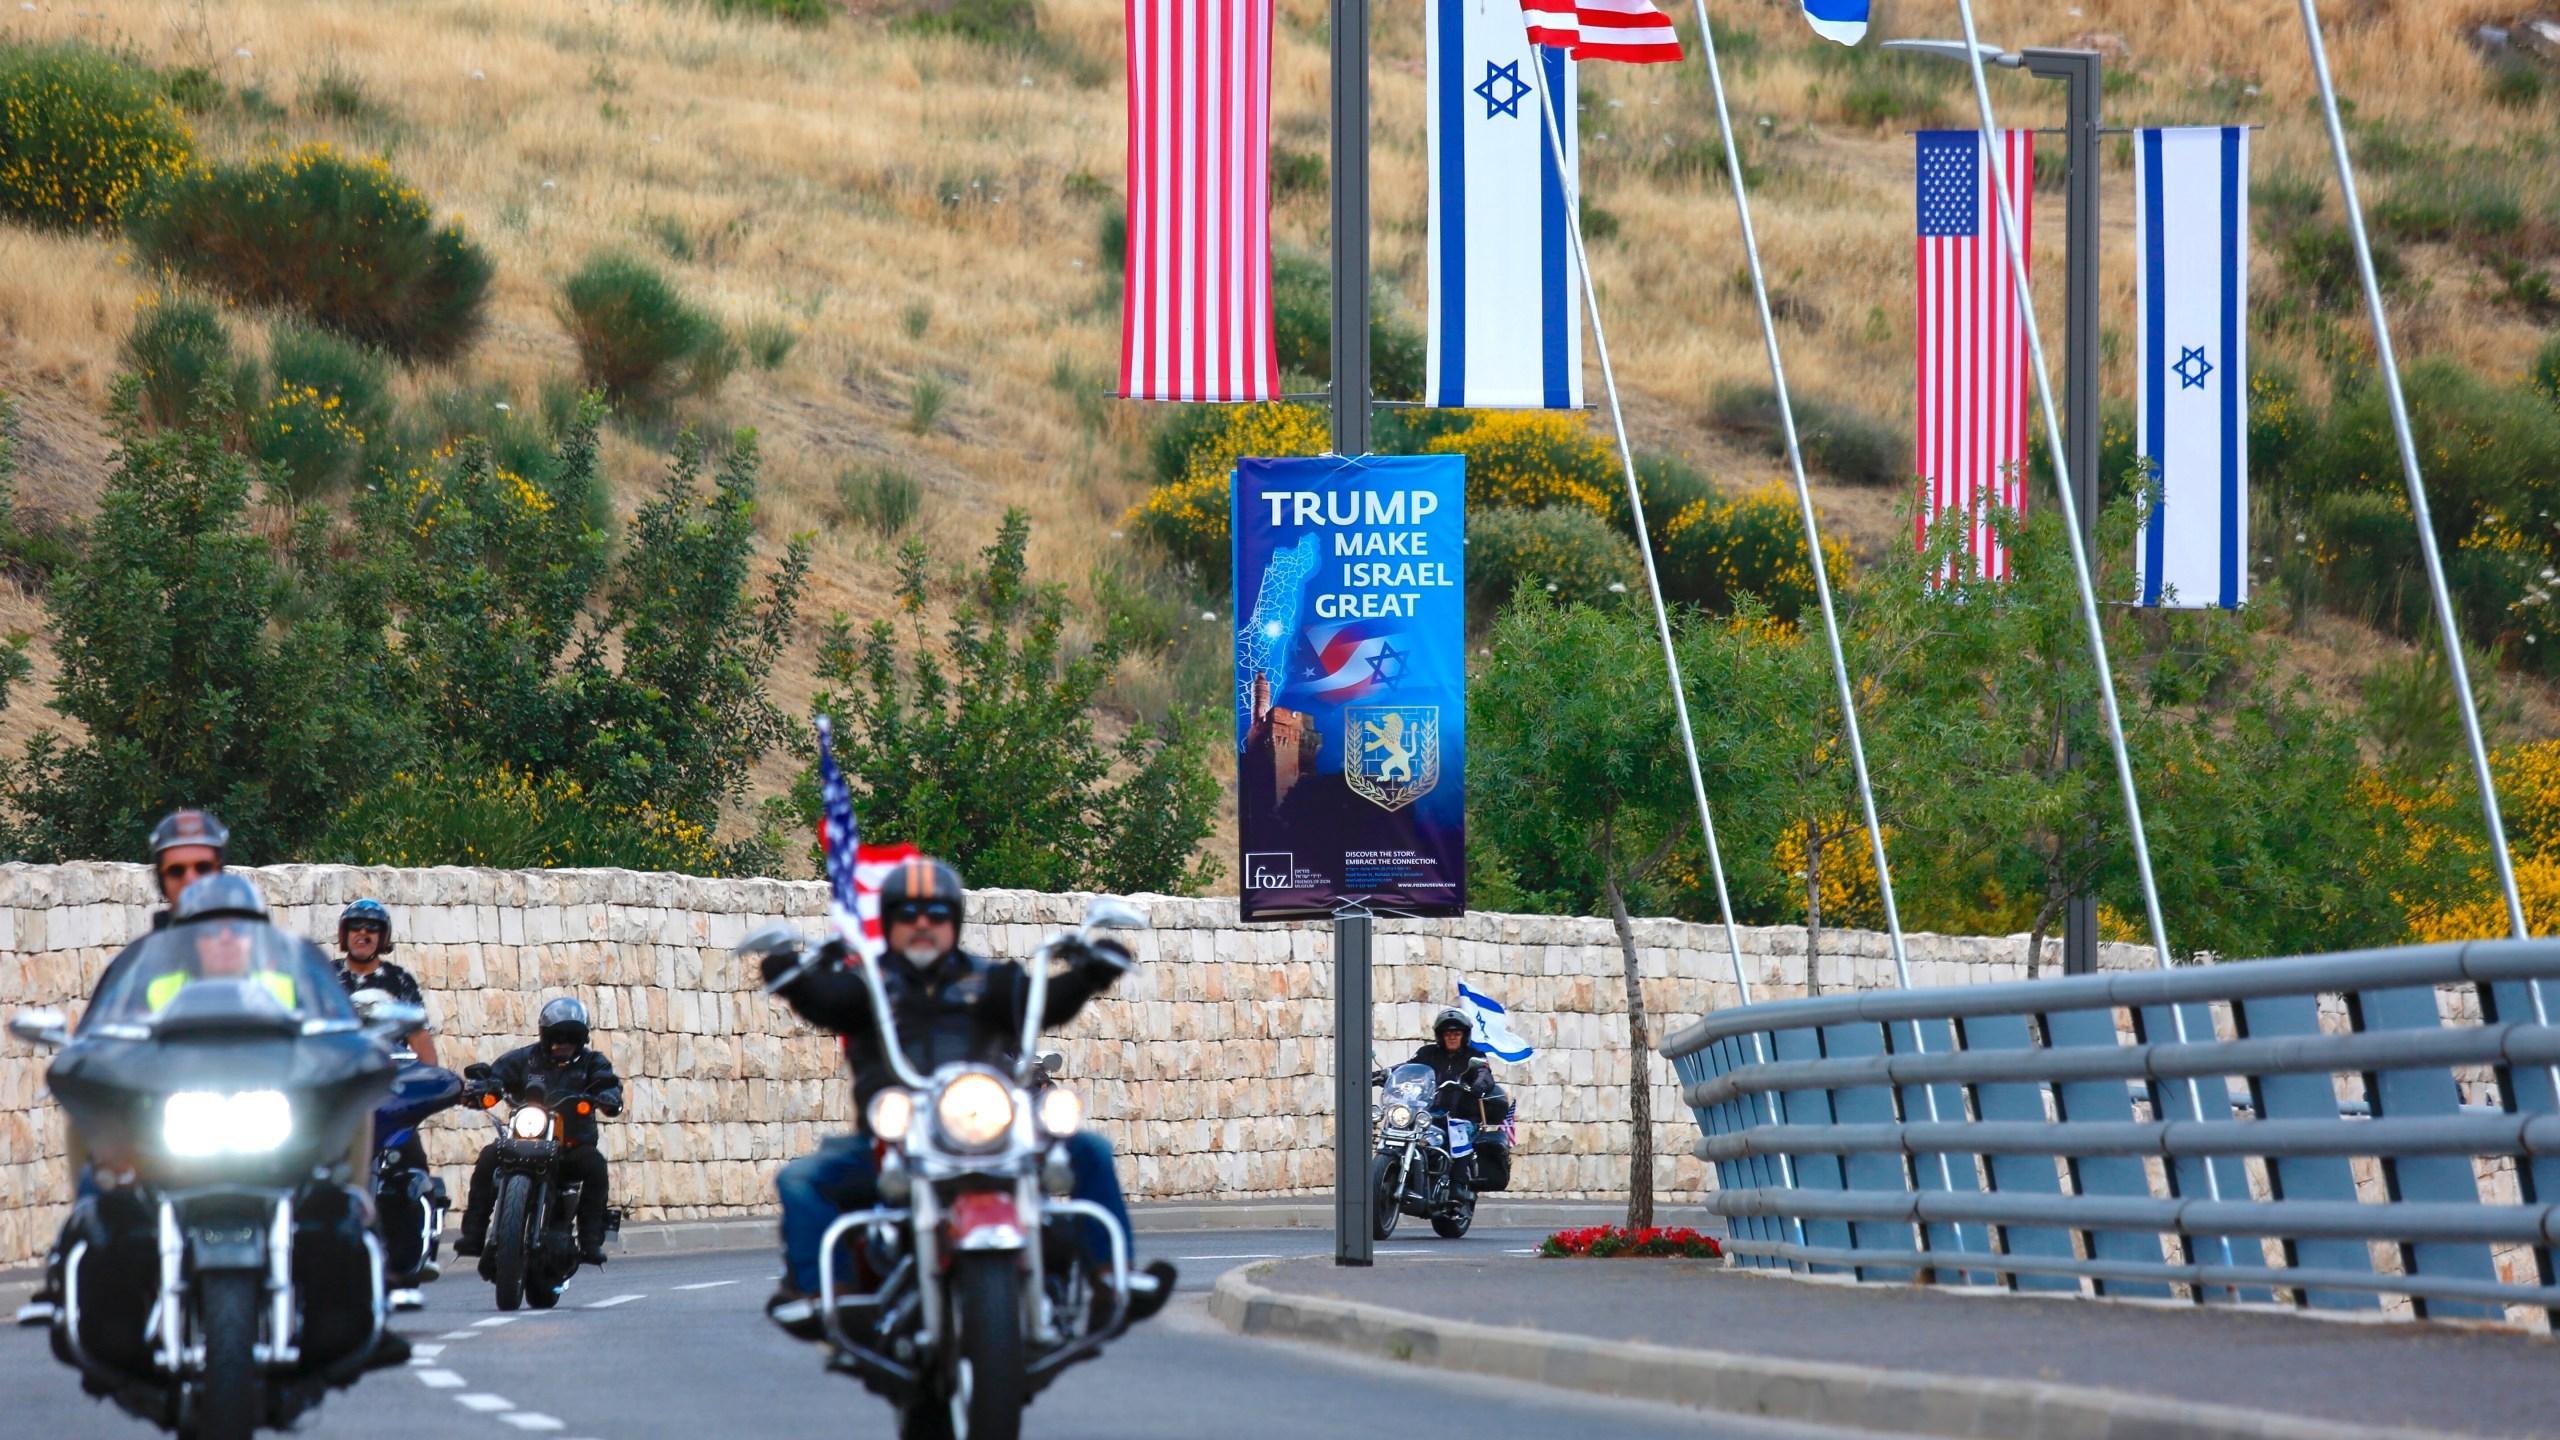 Israel_US_Embassy_16825-159532.jpg04053157